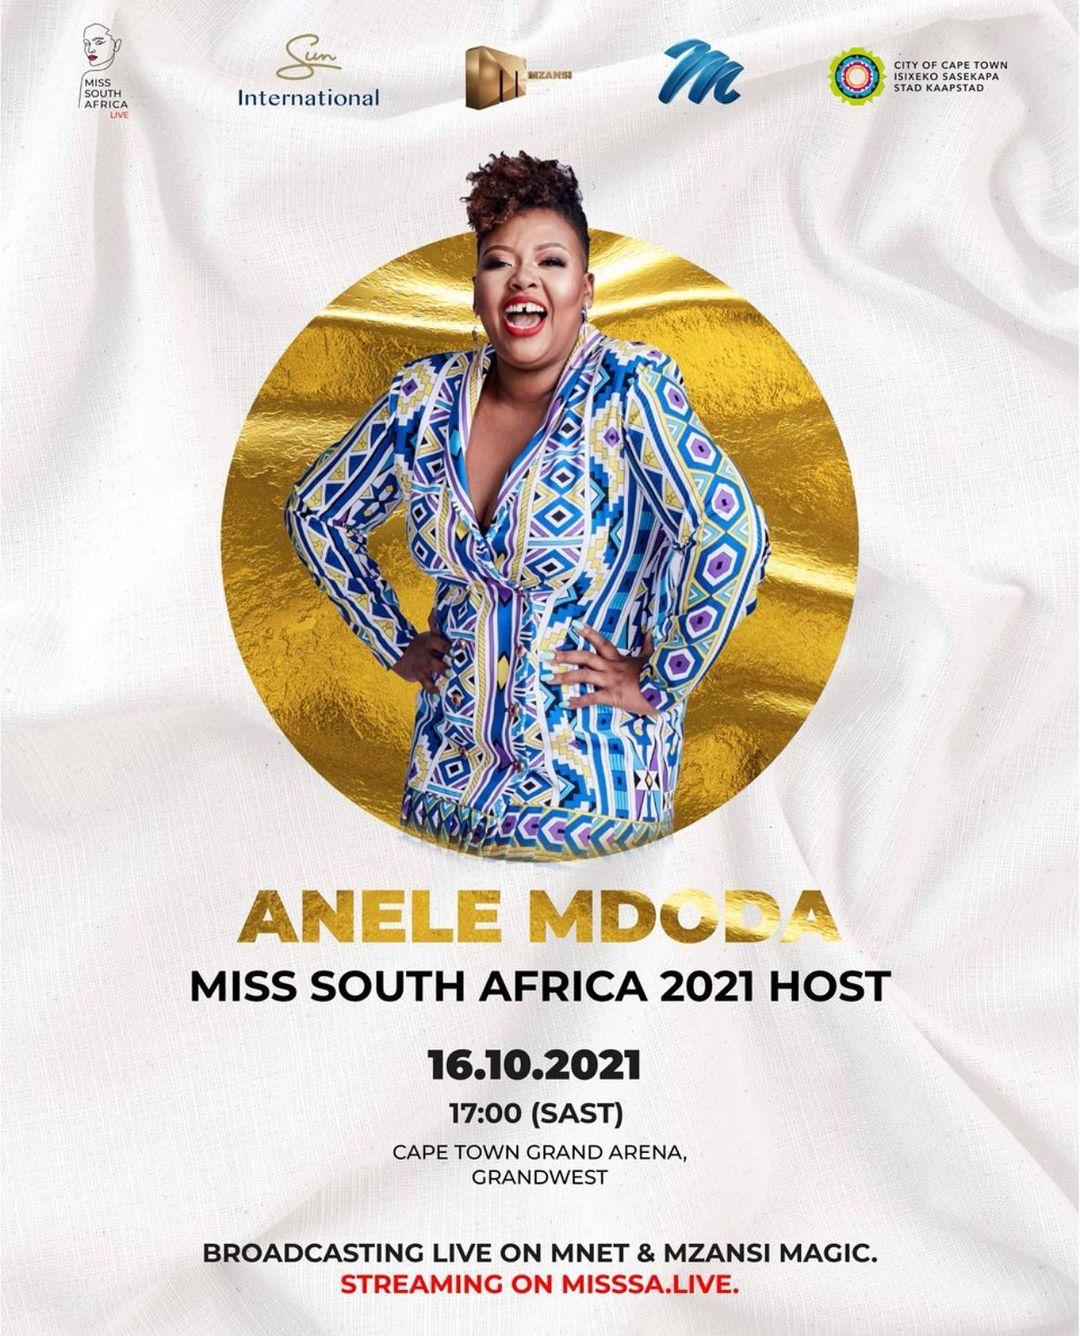 Anele Mdoda and Nico Panagio to host Miss SA 2021